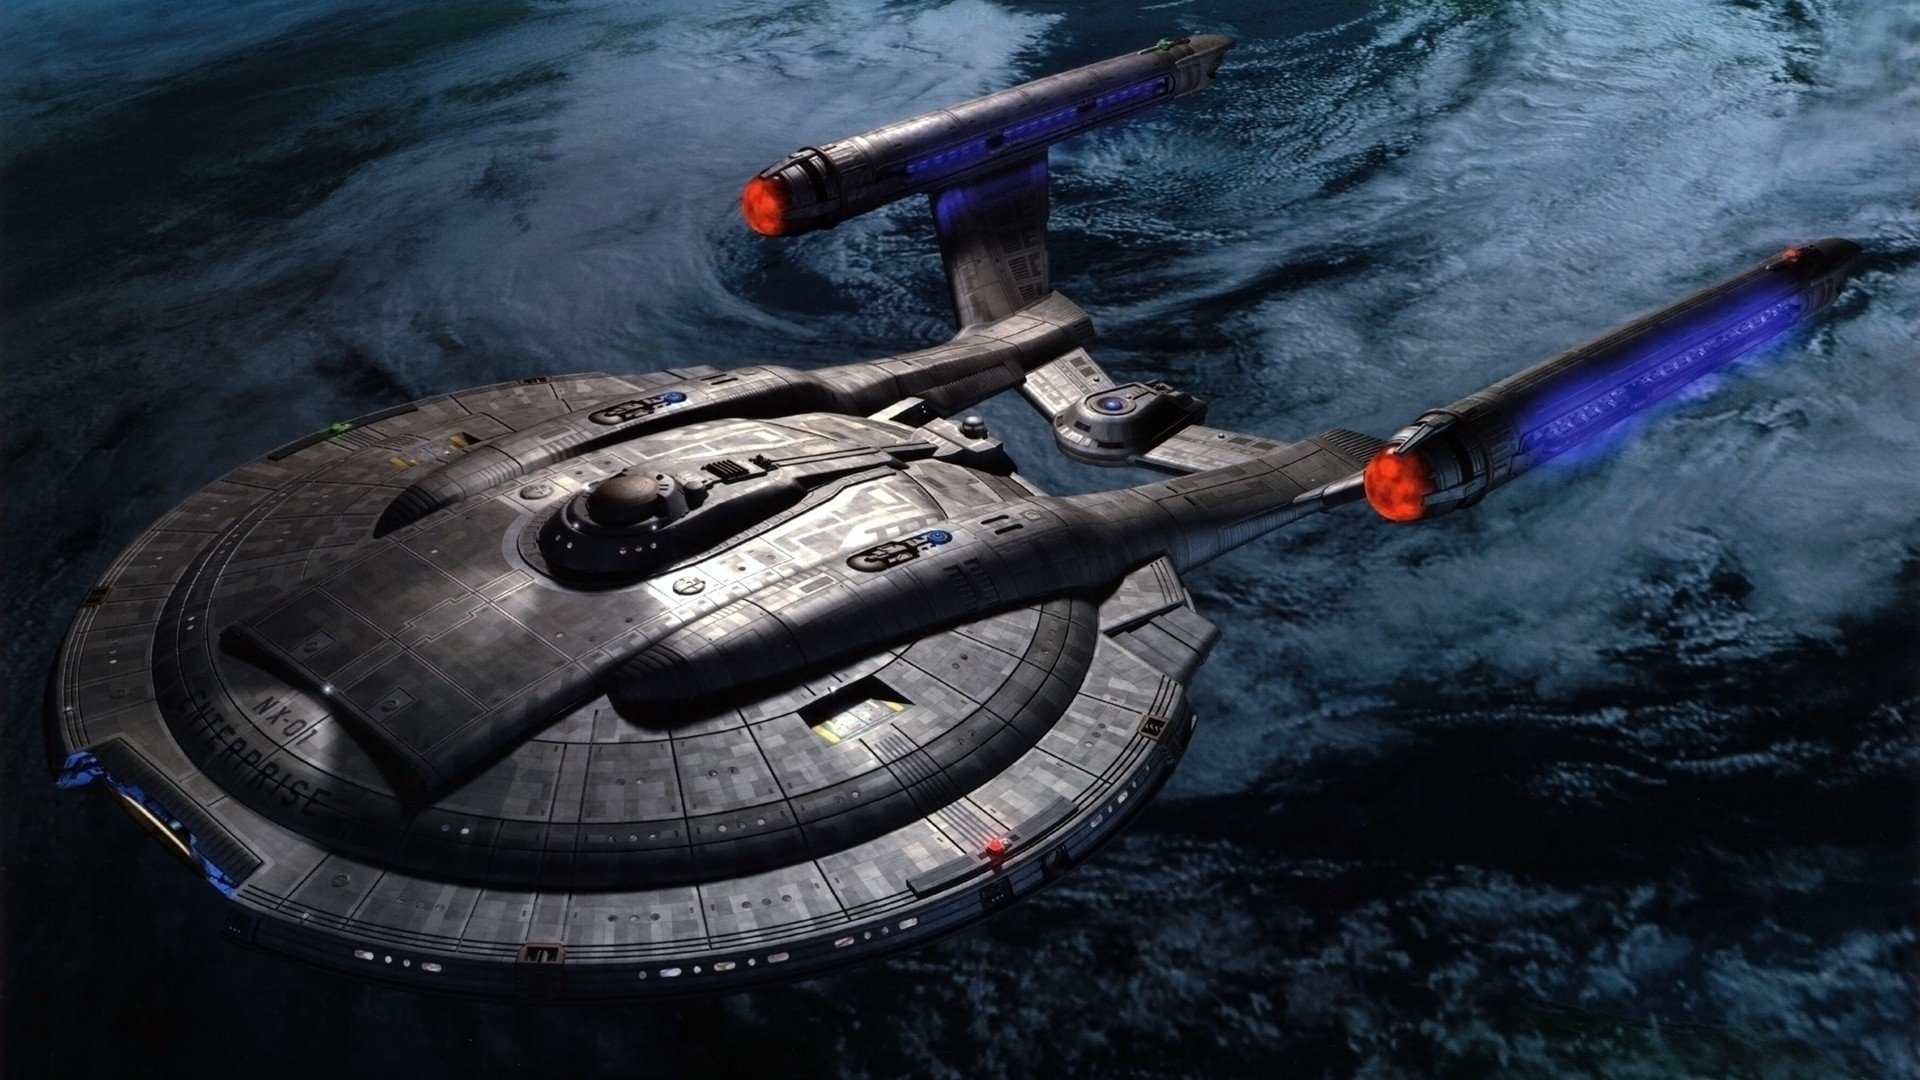 51 star trek: enterprise hd wallpapers | background images